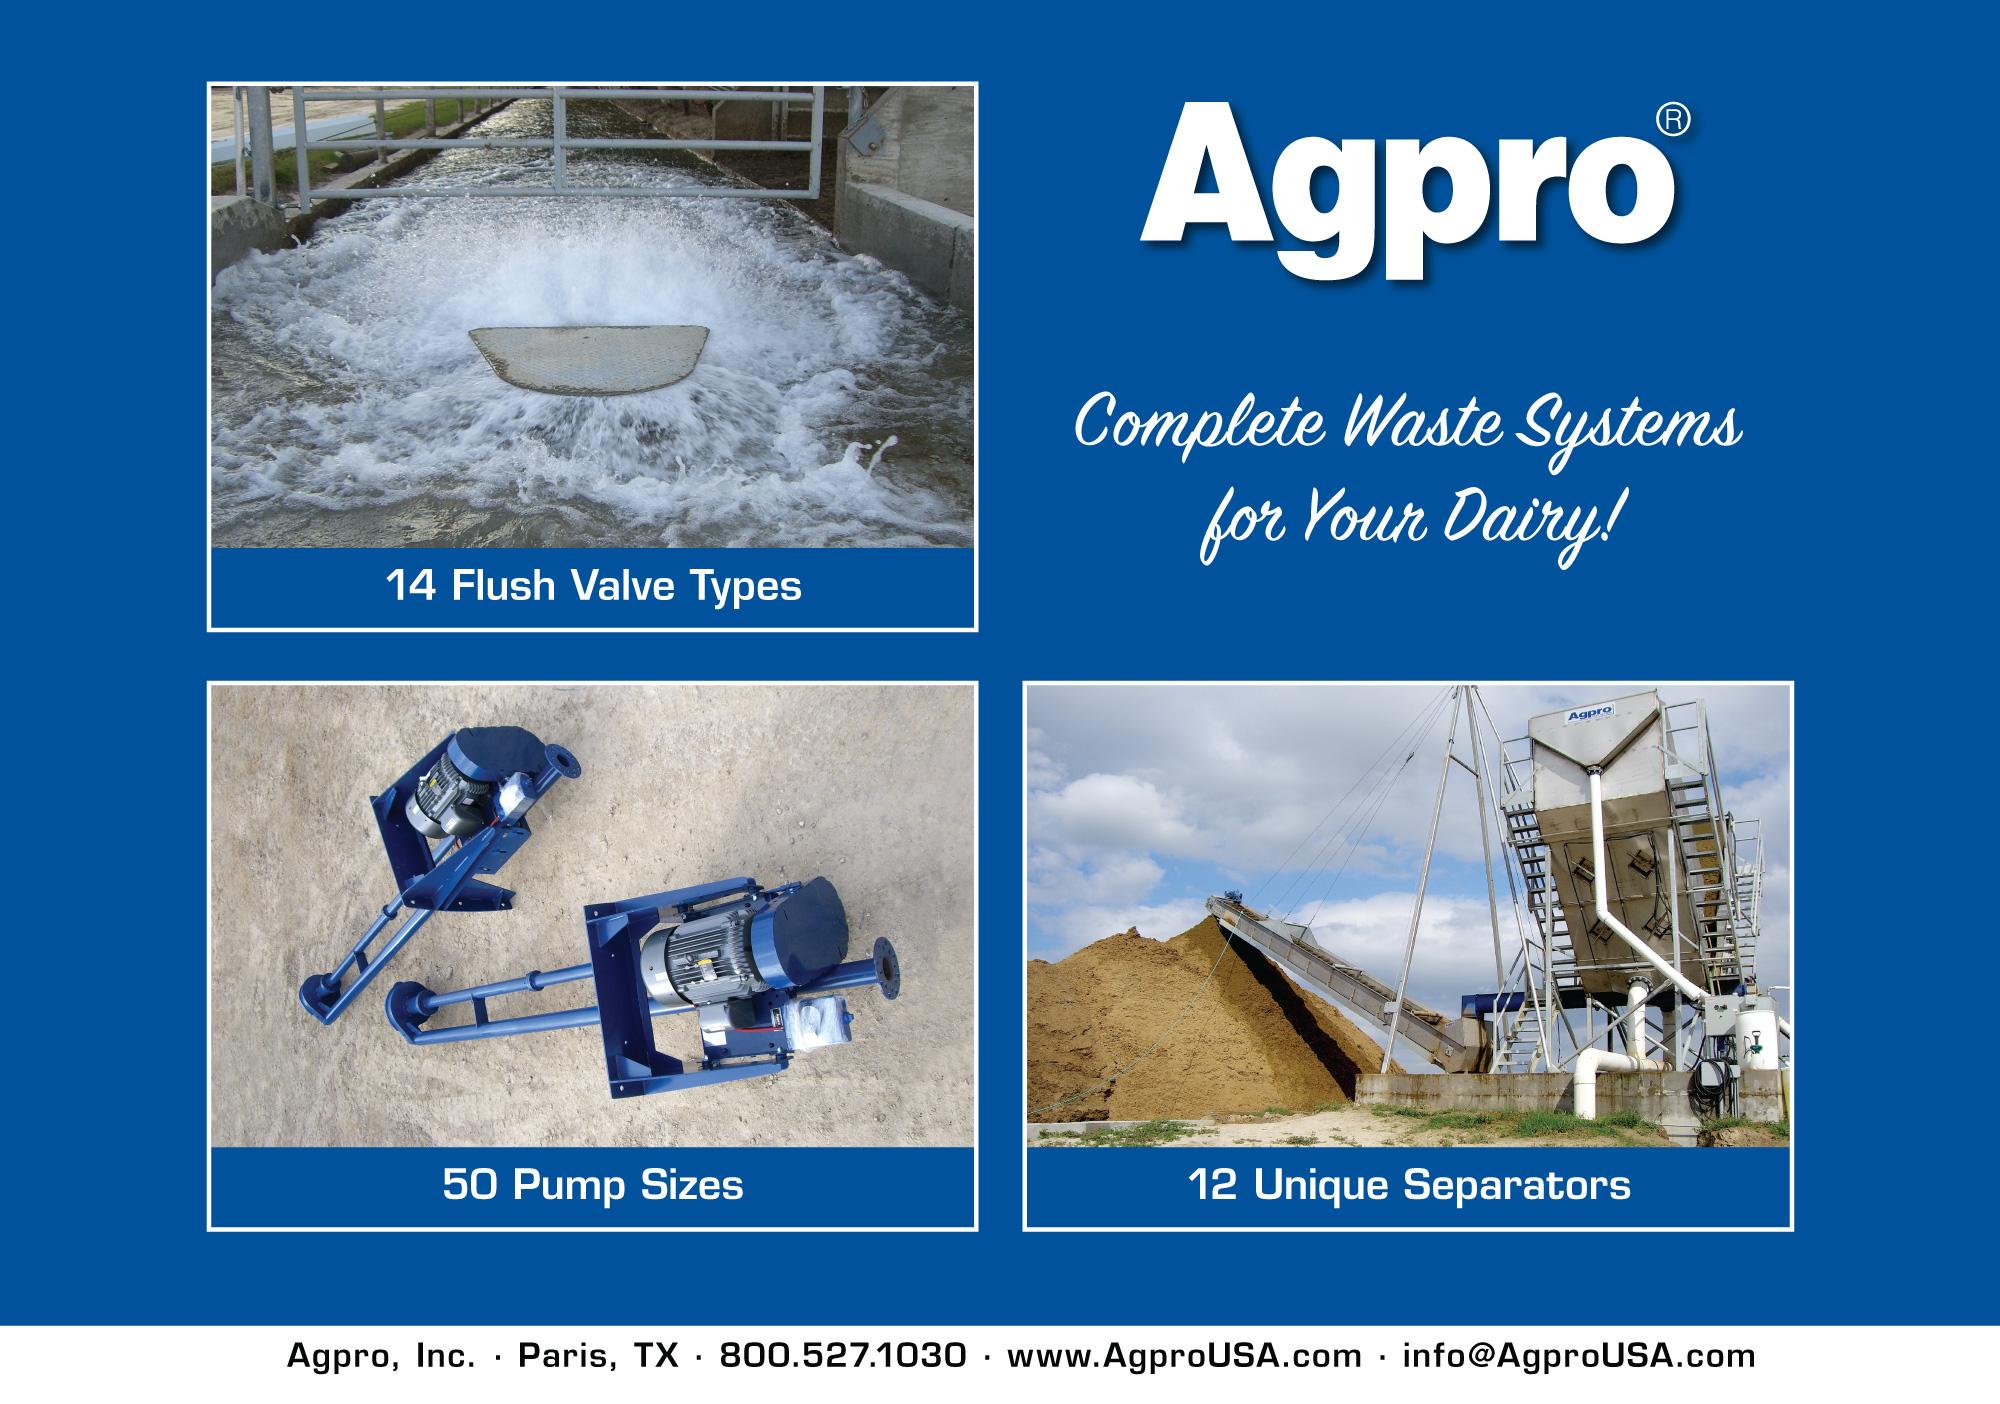 Agpro ad